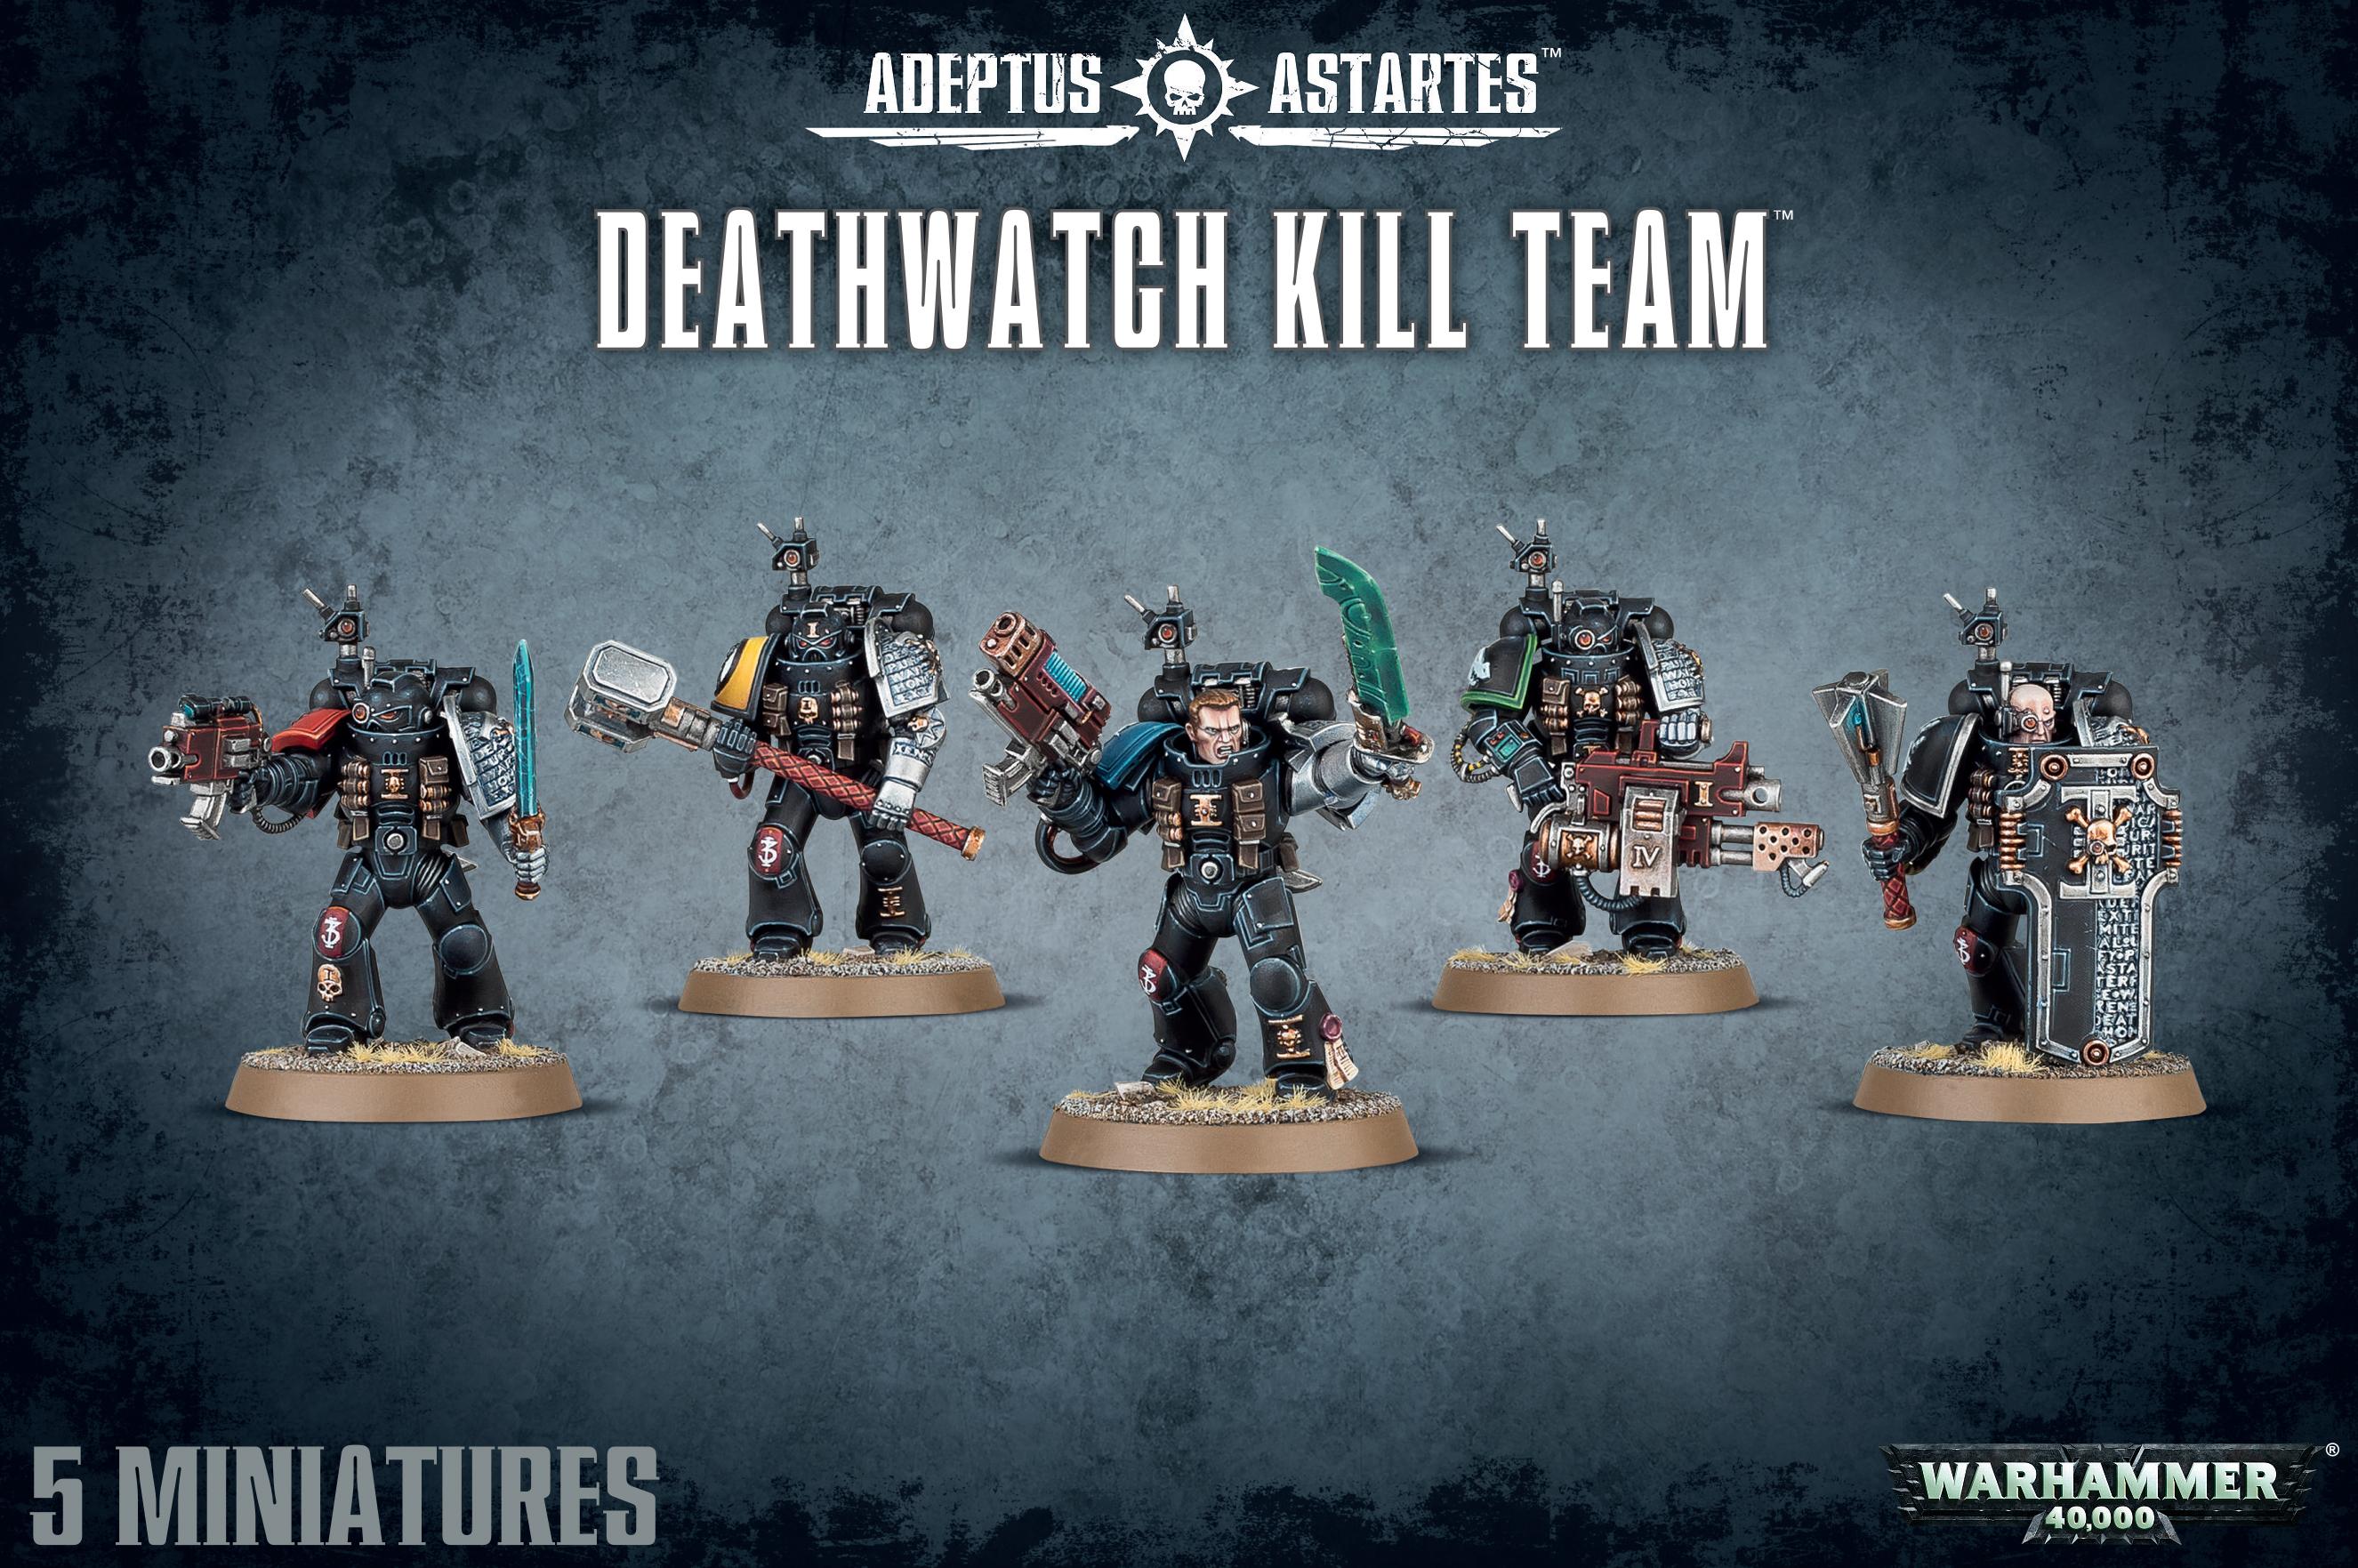 Deathwatch Kill Team